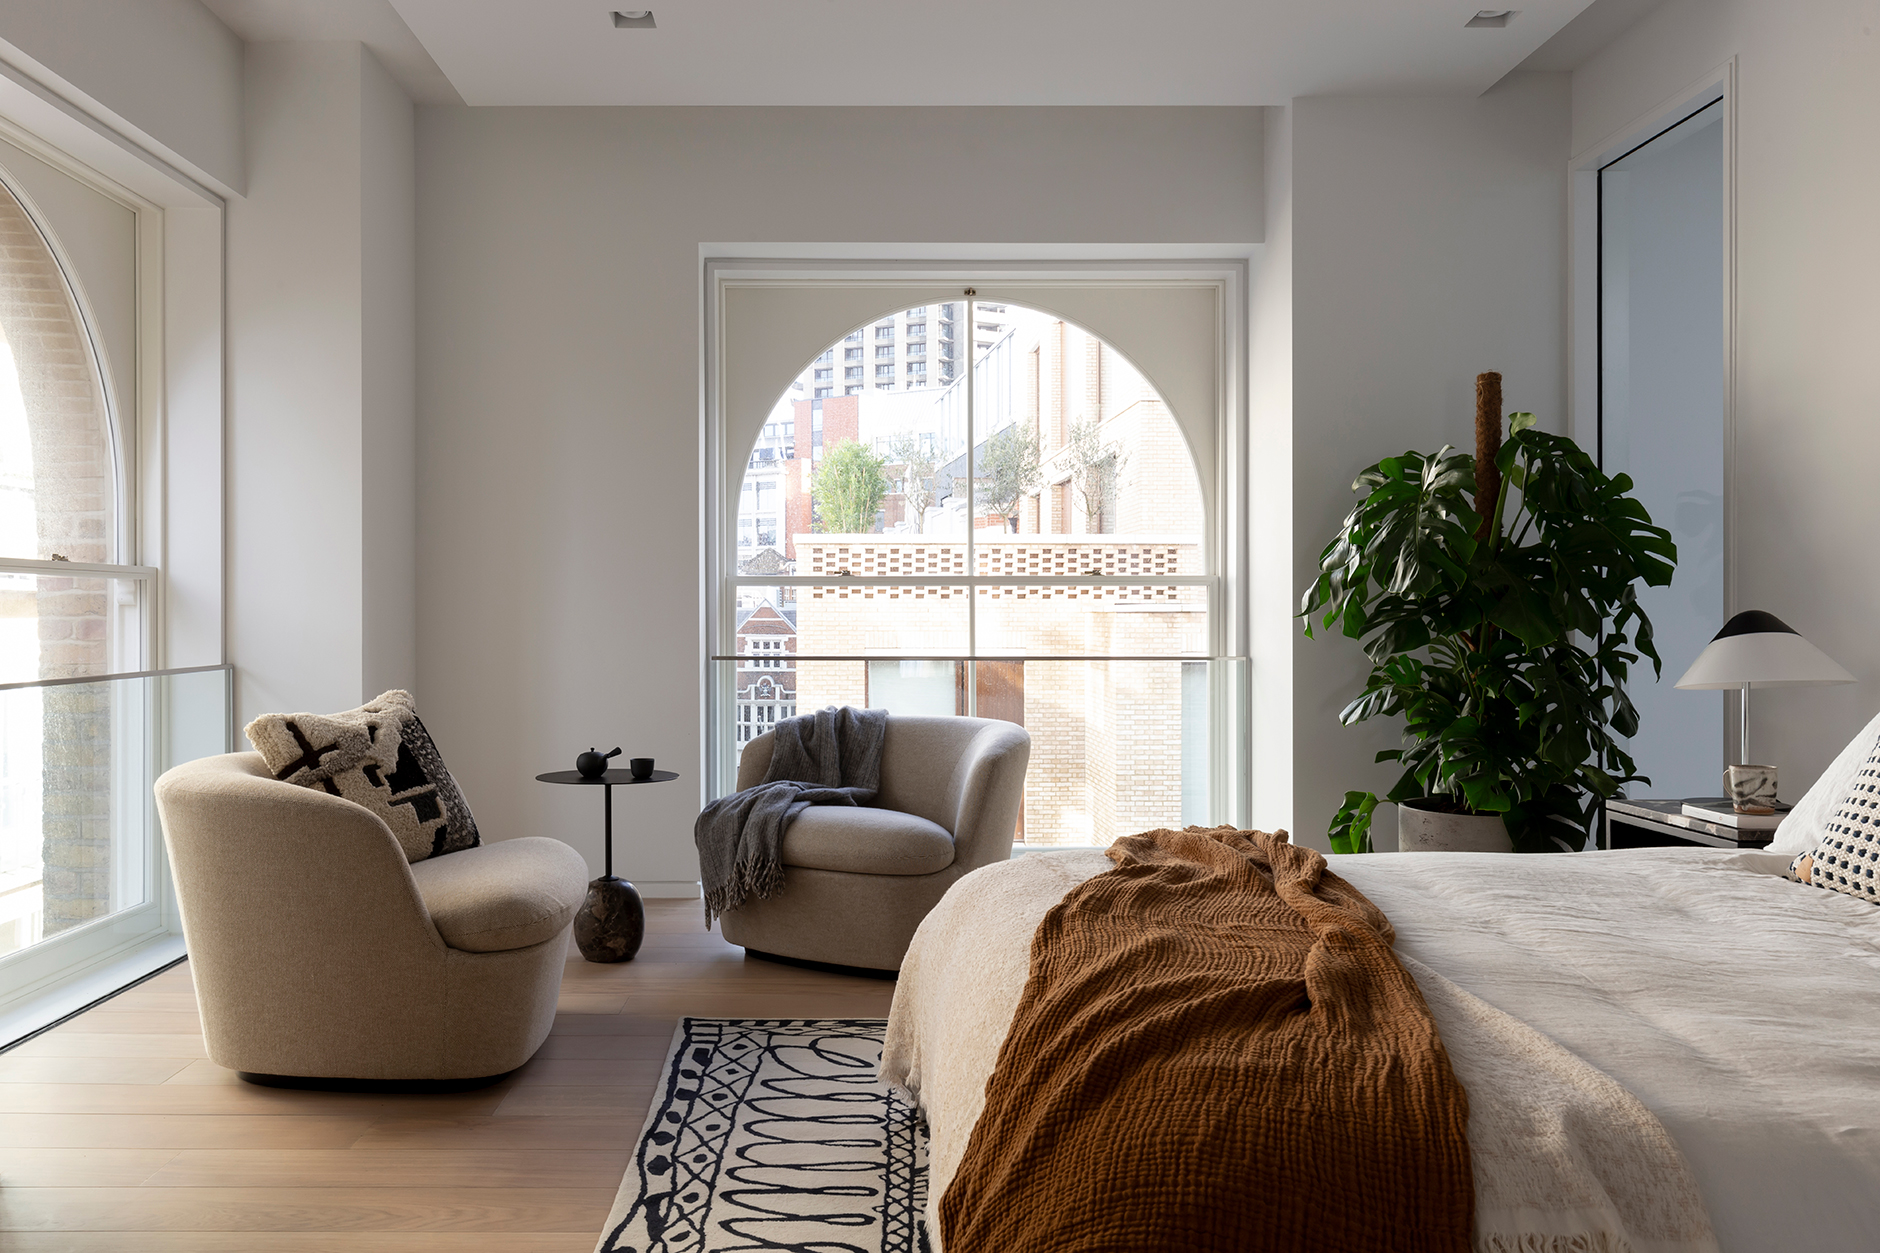 Interior Design Barts Square Hogarth House Bedroom